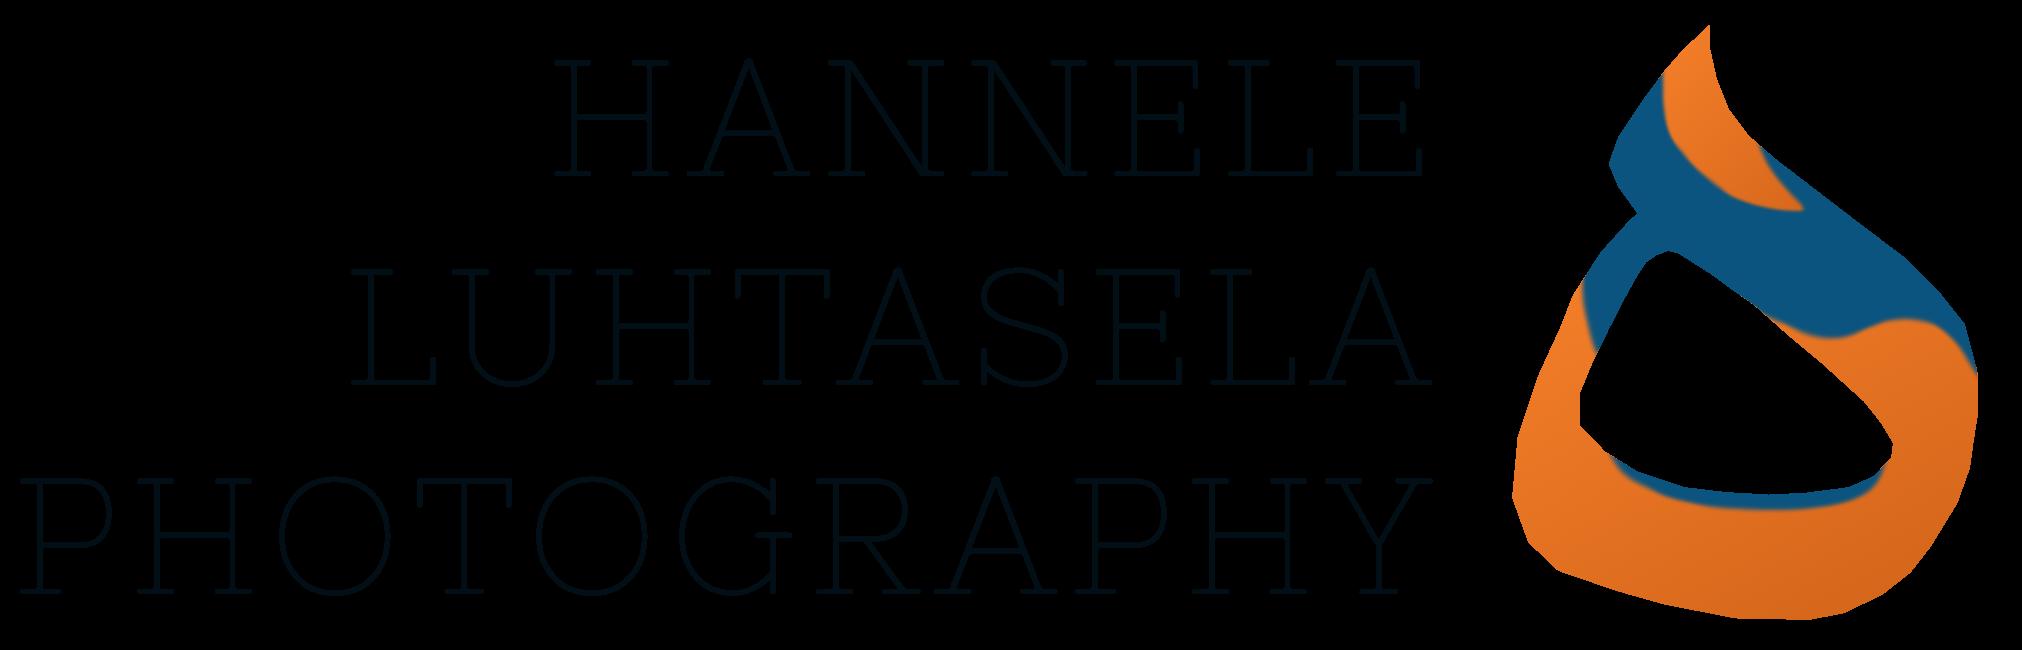 Hannele Luhtasela Photography